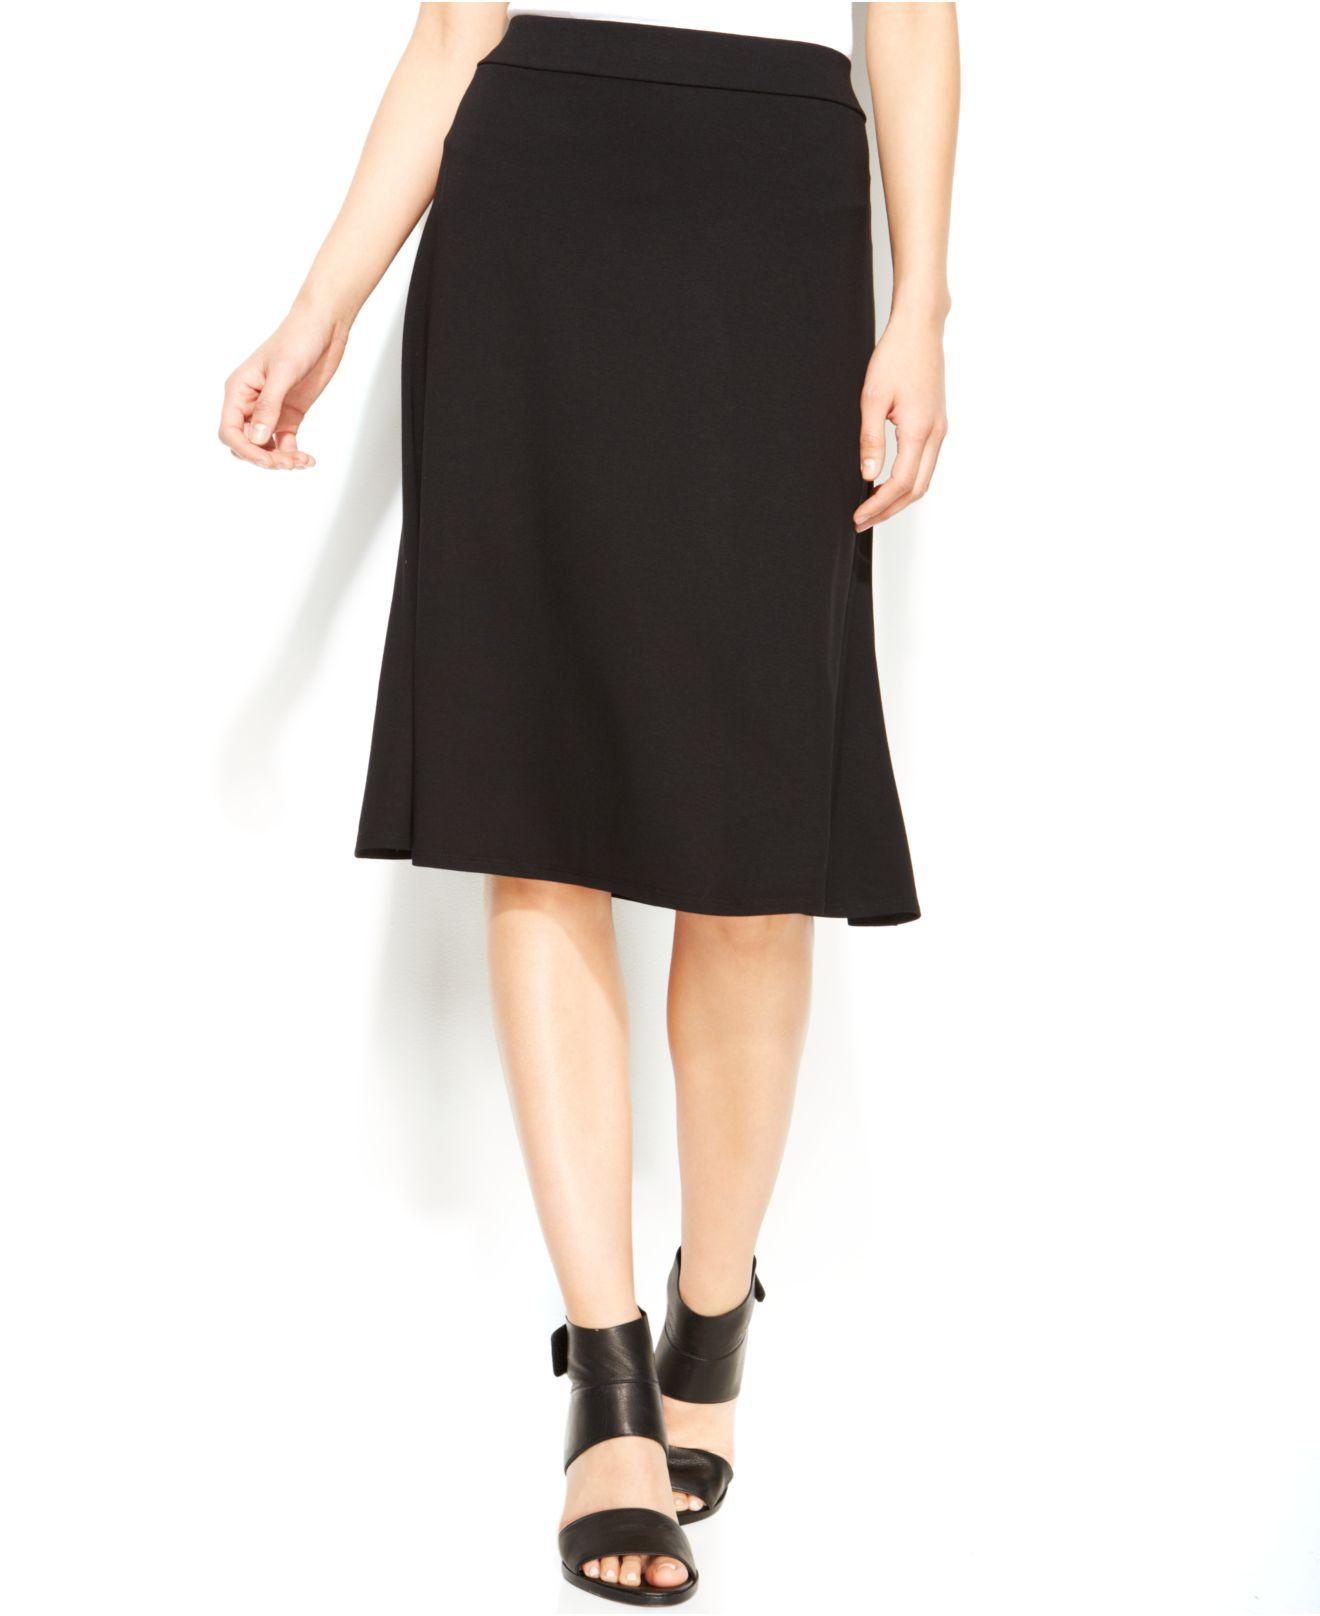 eileen fisher solid knee length flare skirt in black lyst